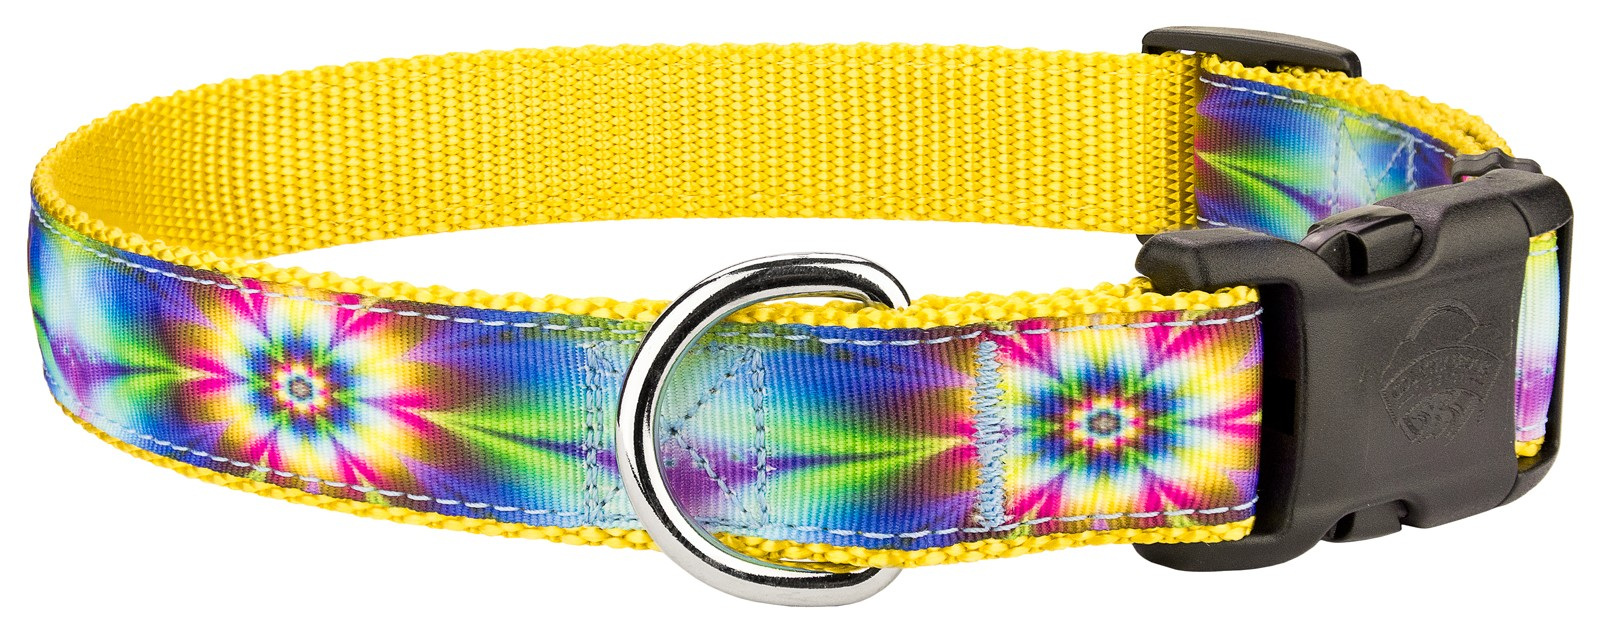 Buy deluxe tie dye flowers ribbon dog collar online for Order tie dye roses online